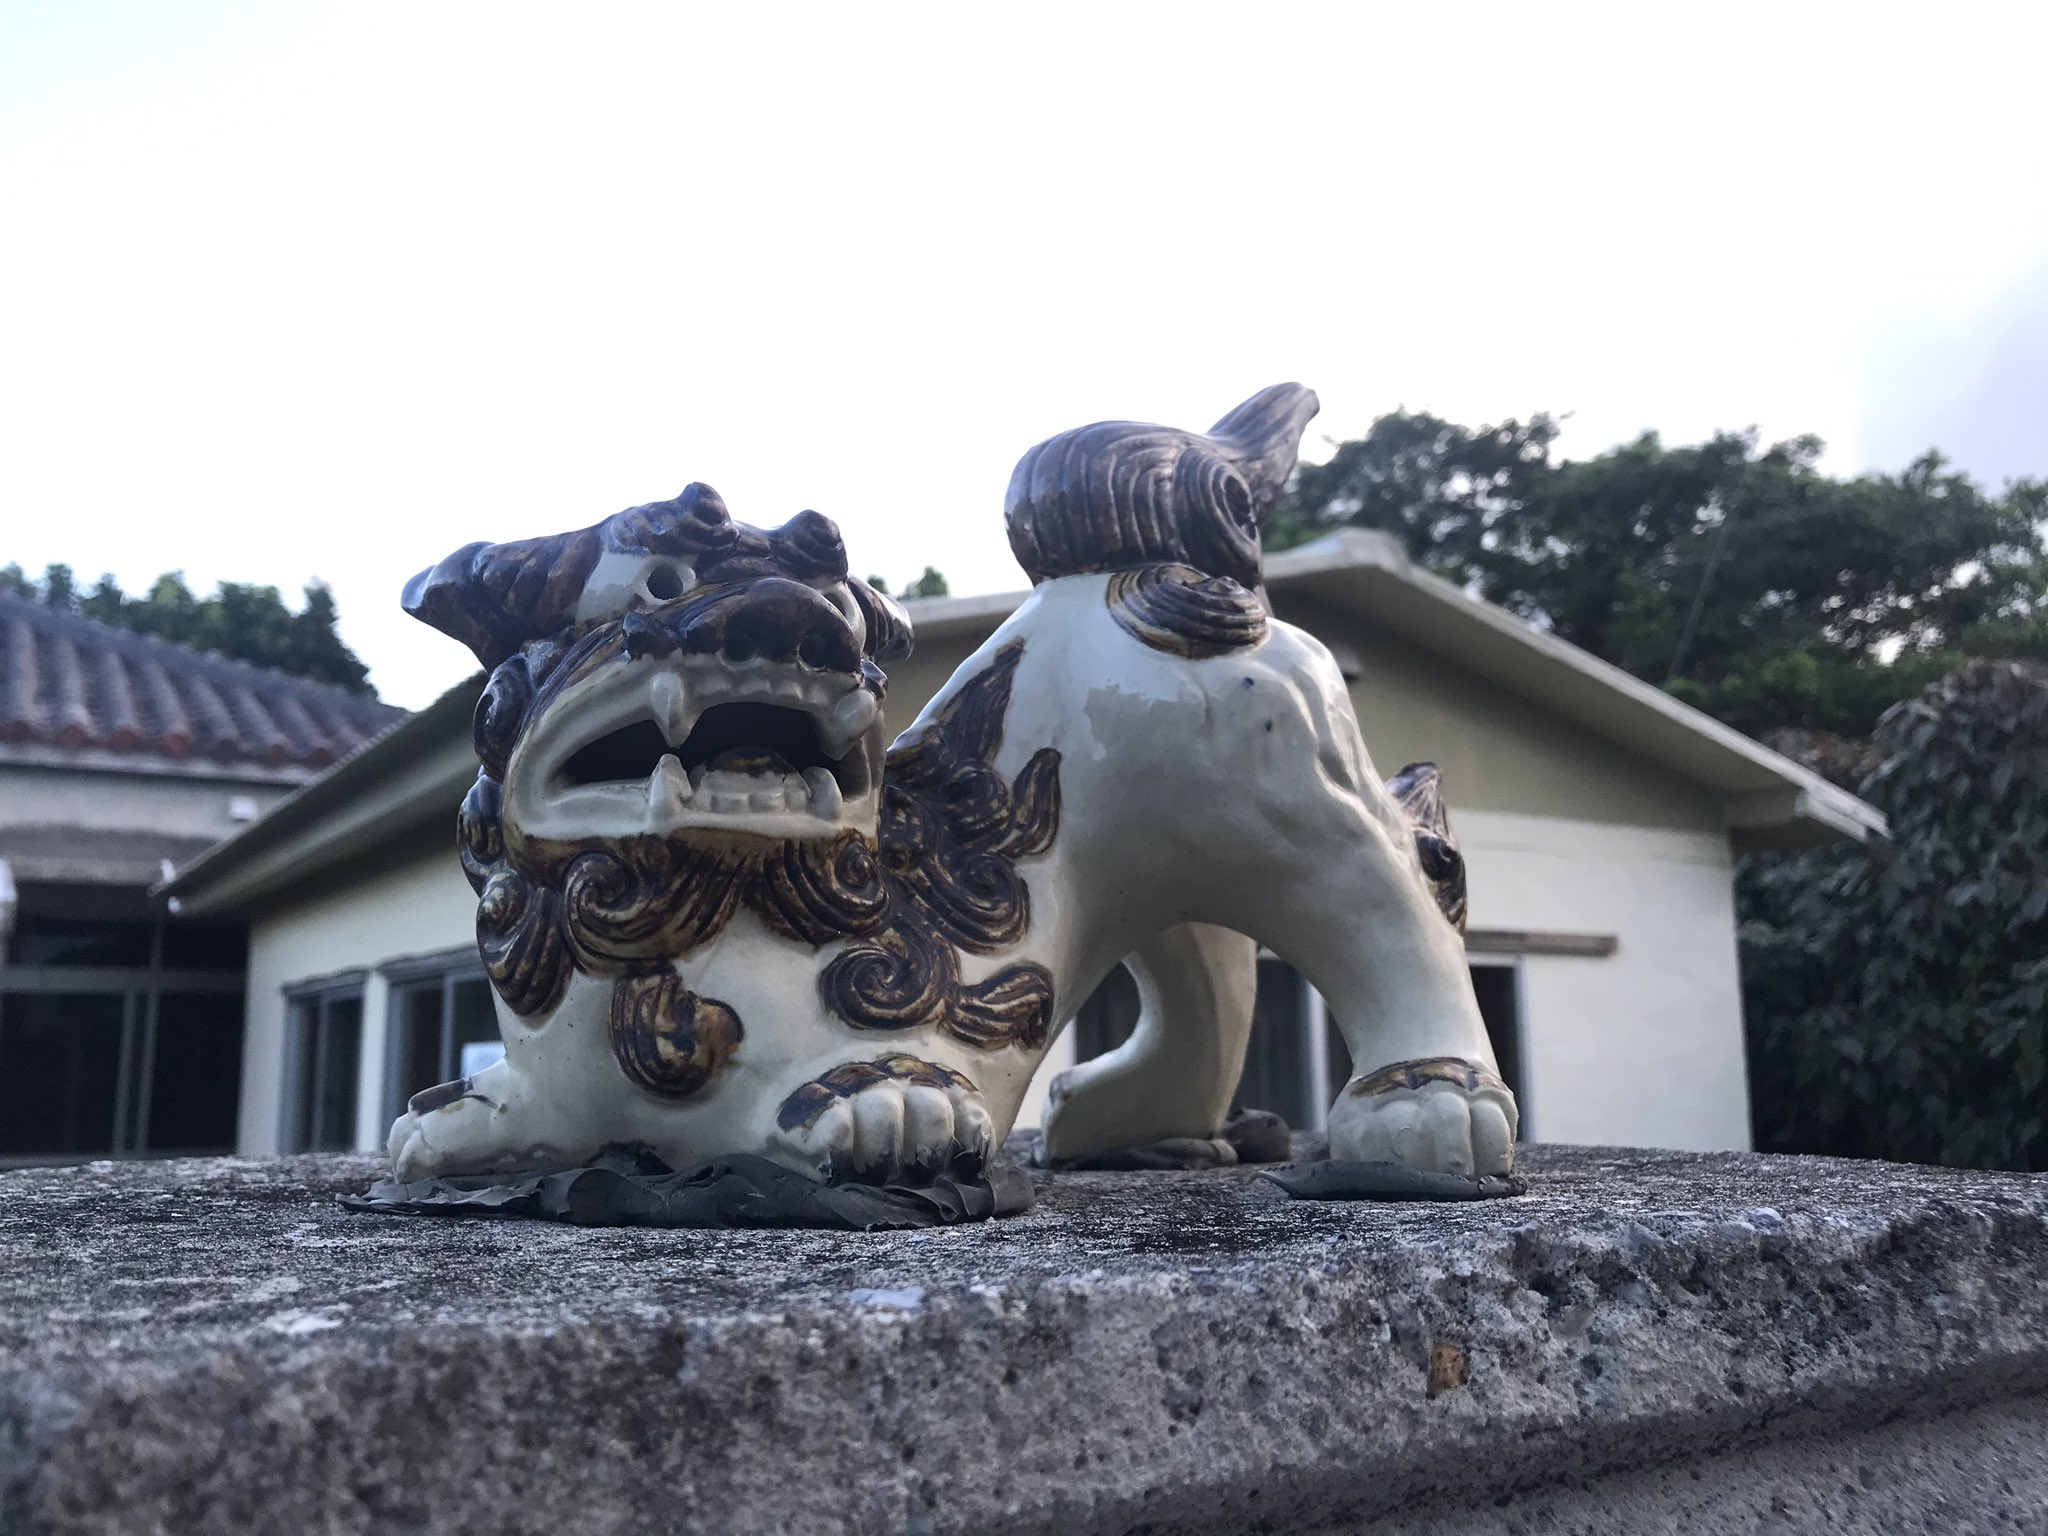 Pottery shisa